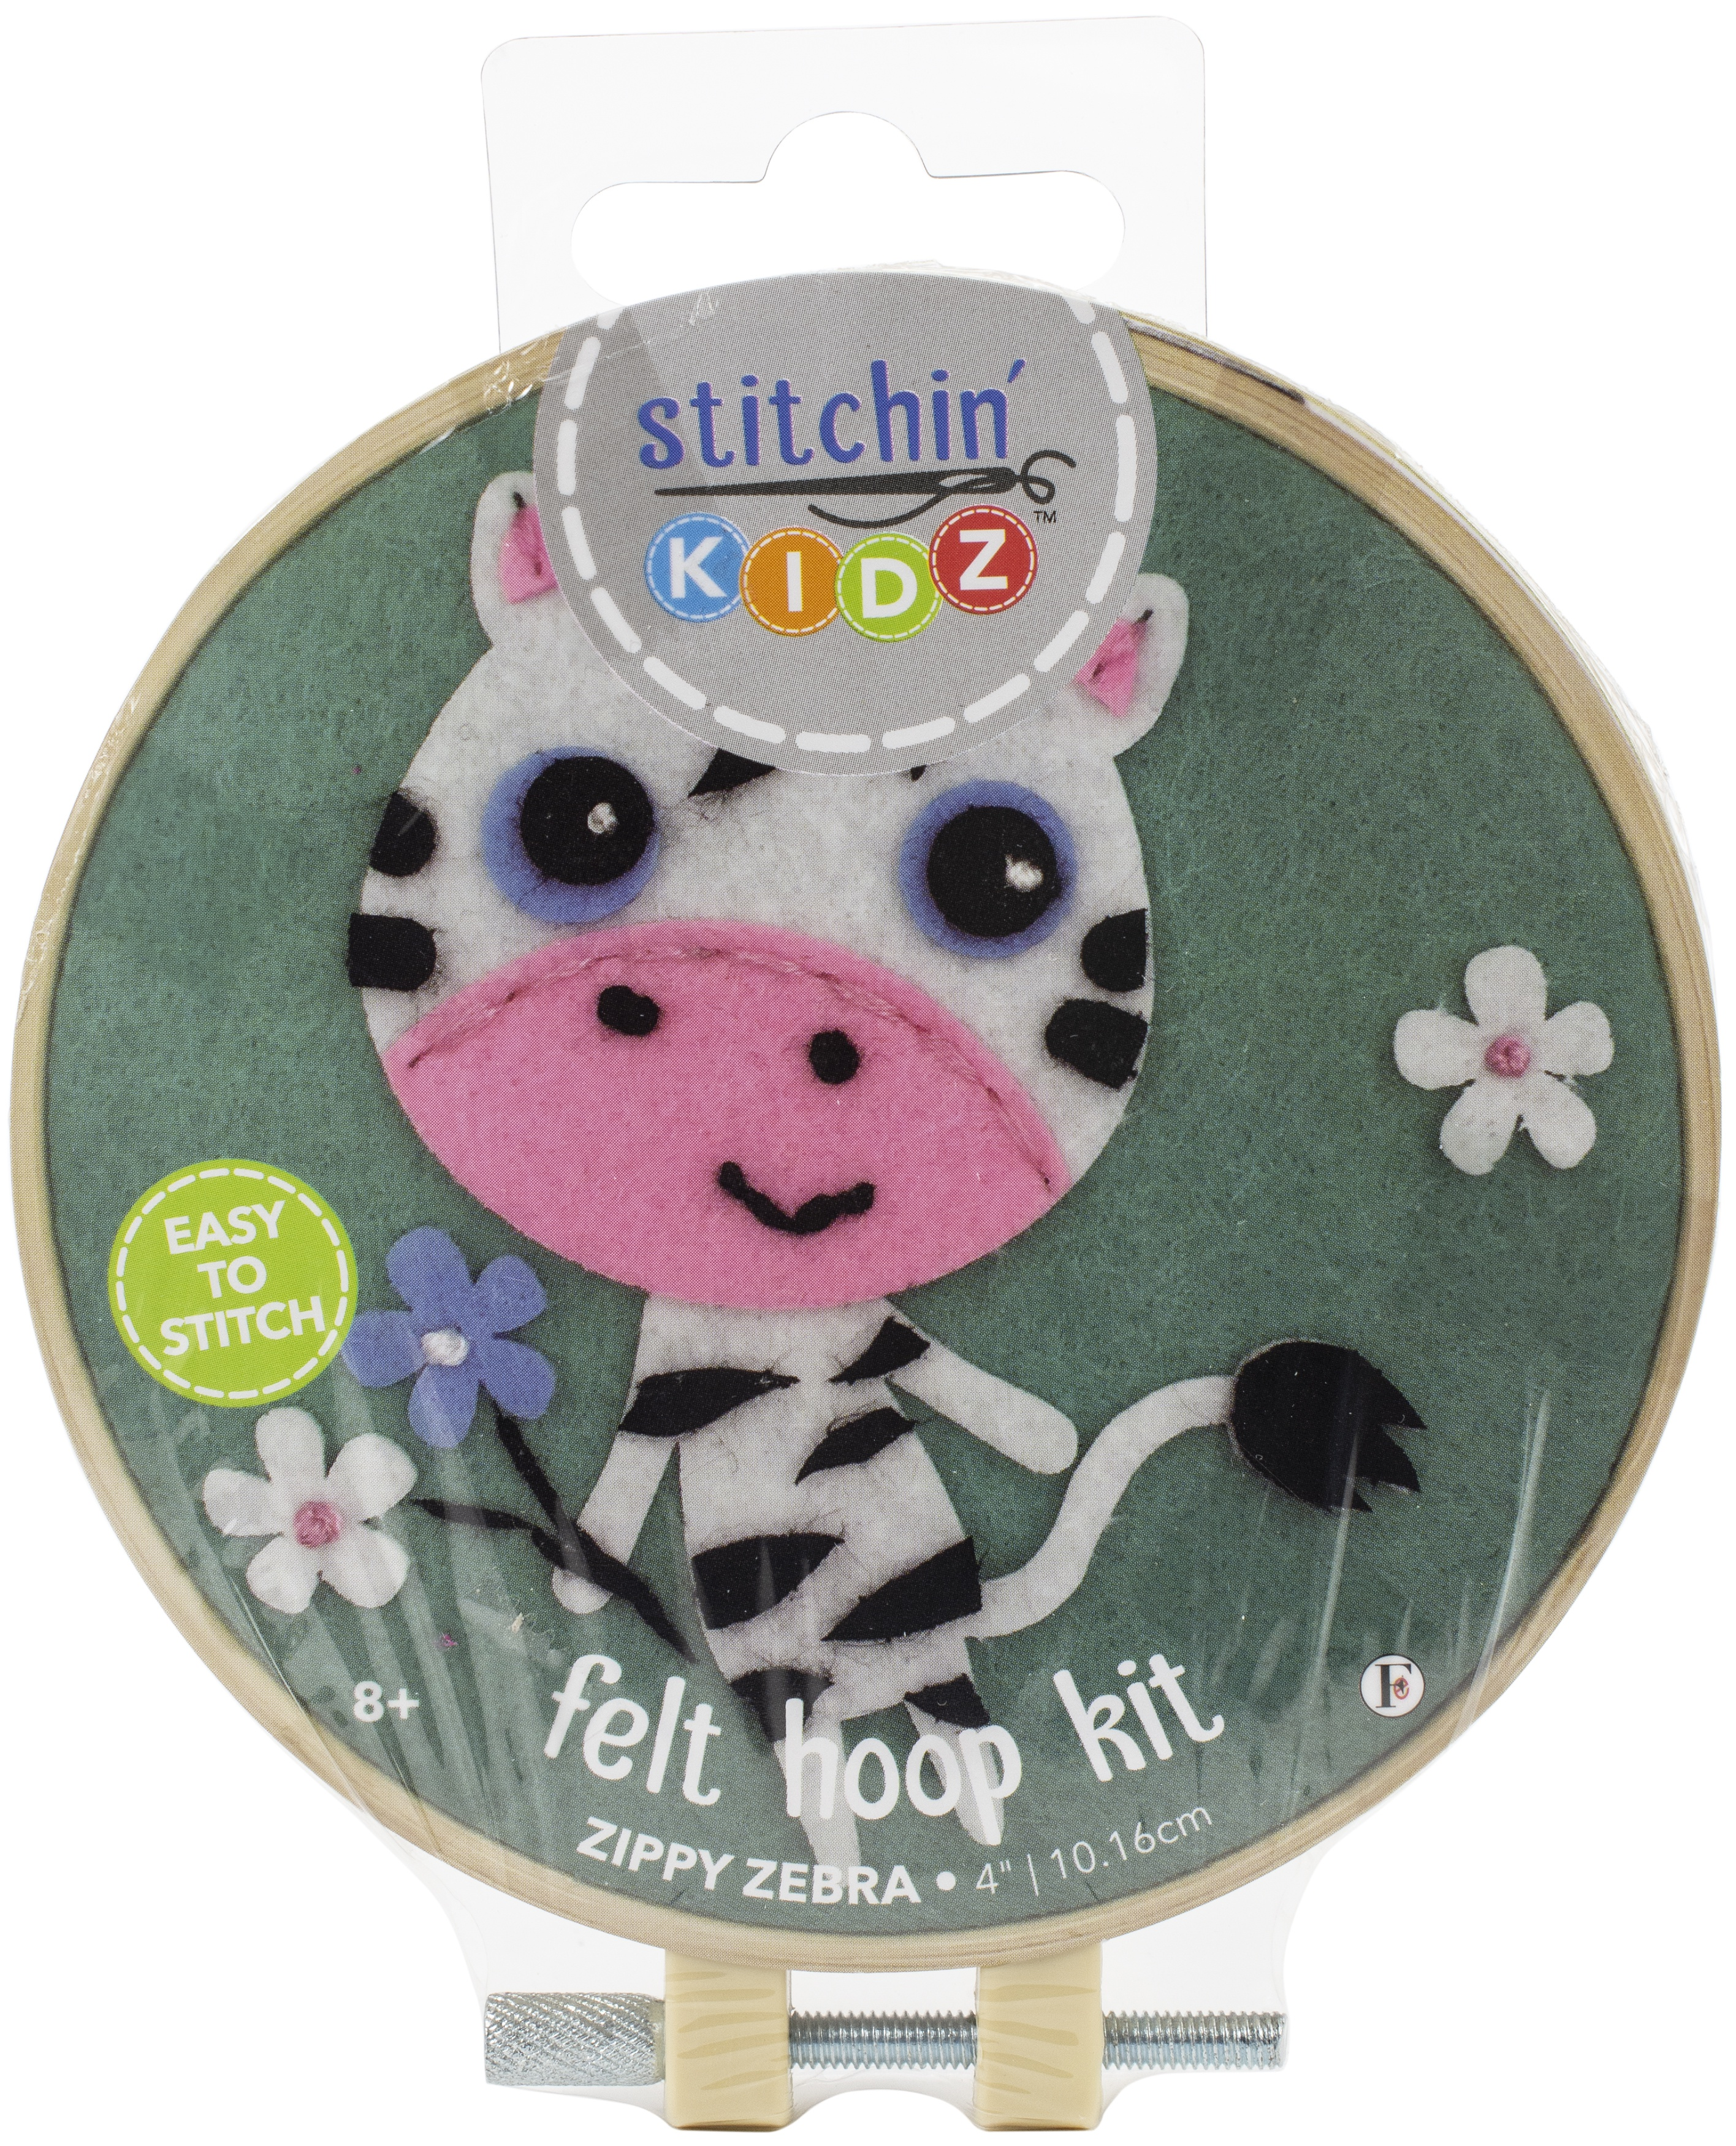 Fabric Editions Stitchin' Kidz Felt Hoop Kit 4-Zebra